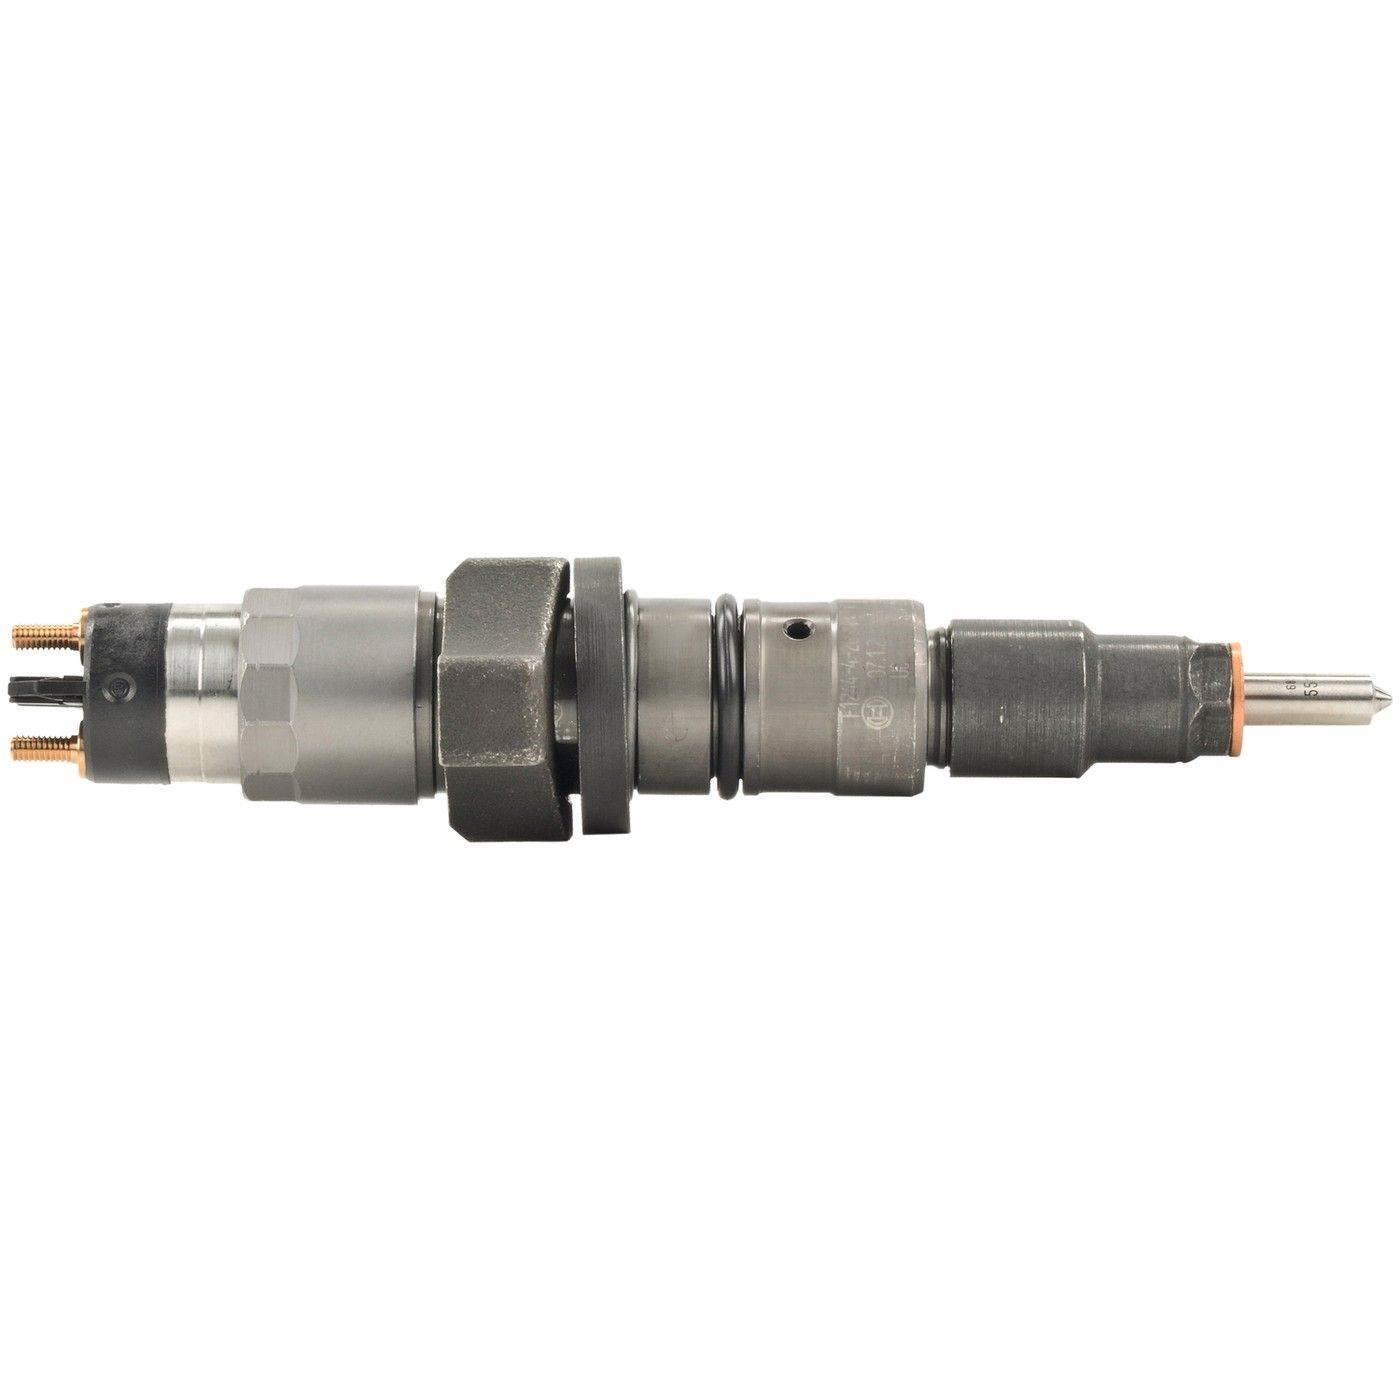 0986435503 - Bosch OEM Diesel fuel injector for 2003-2004 Dodge Cummins 5.9L